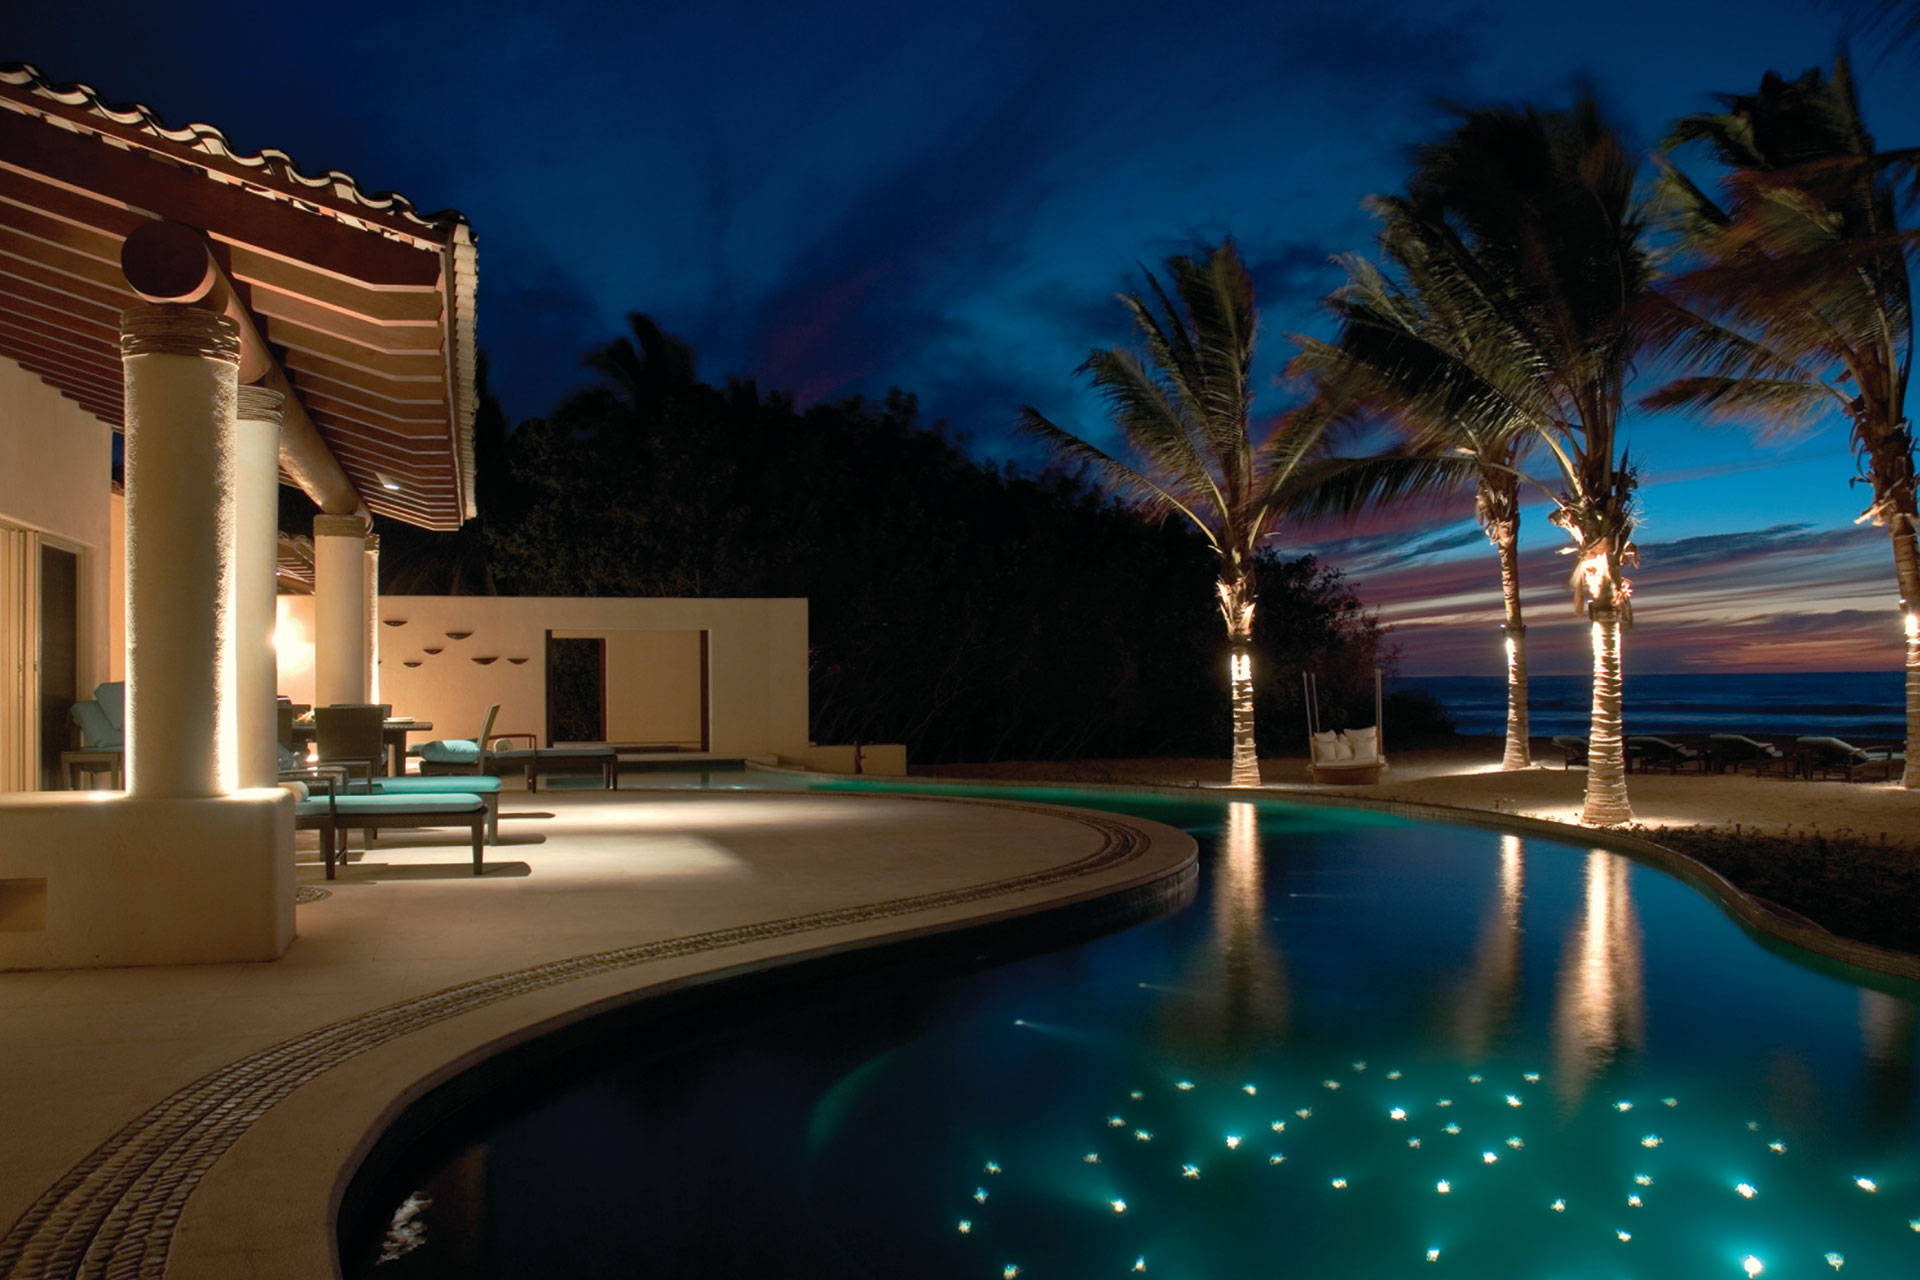 Luxury Villa at Night at the Four Seasons Resort Punta Mita; Courtesy of Four Seasons Resort Punta Mita